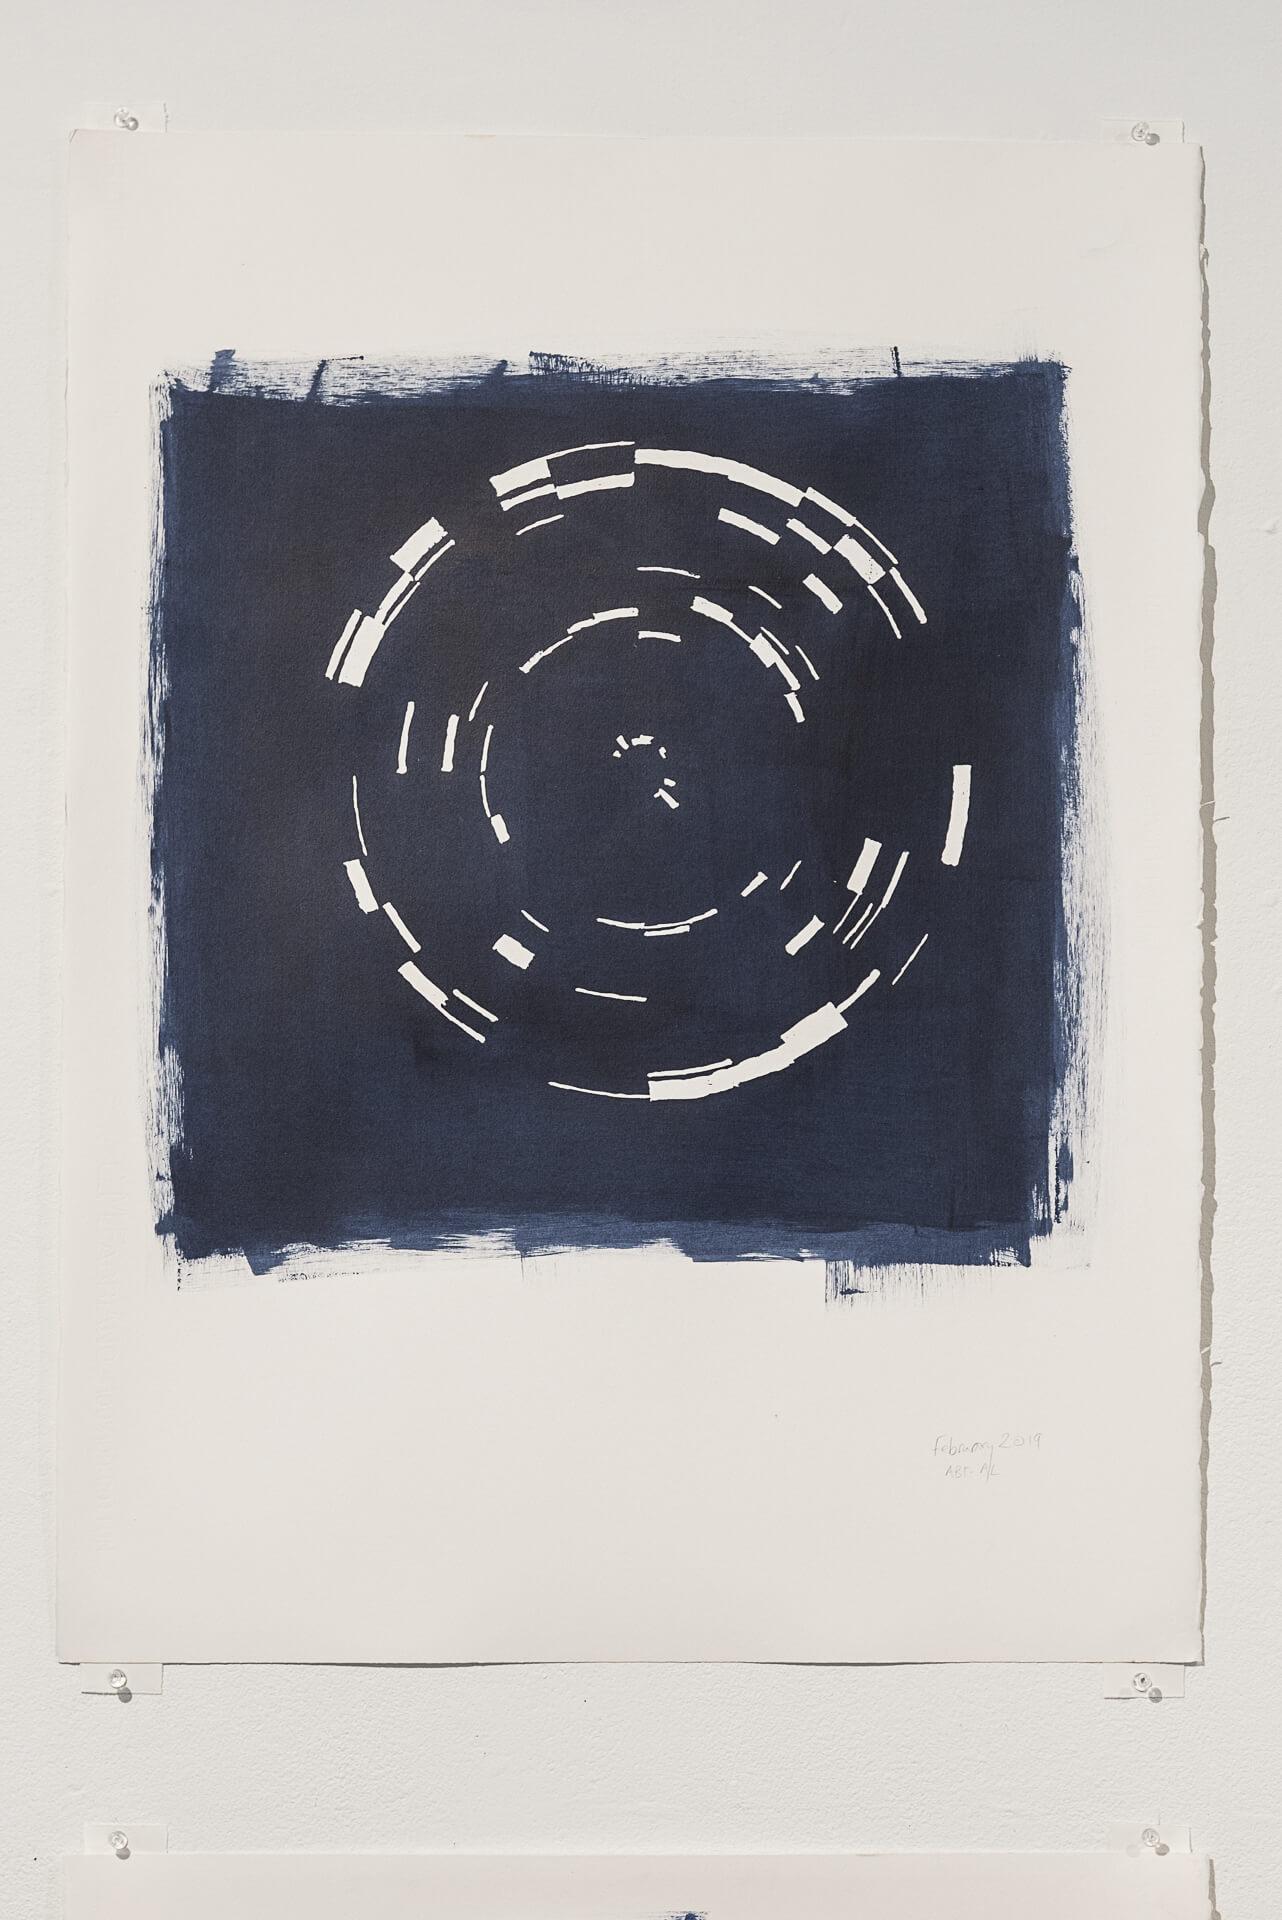 Indigo February 2019   Acrylic on paper, 30 x 22 inches